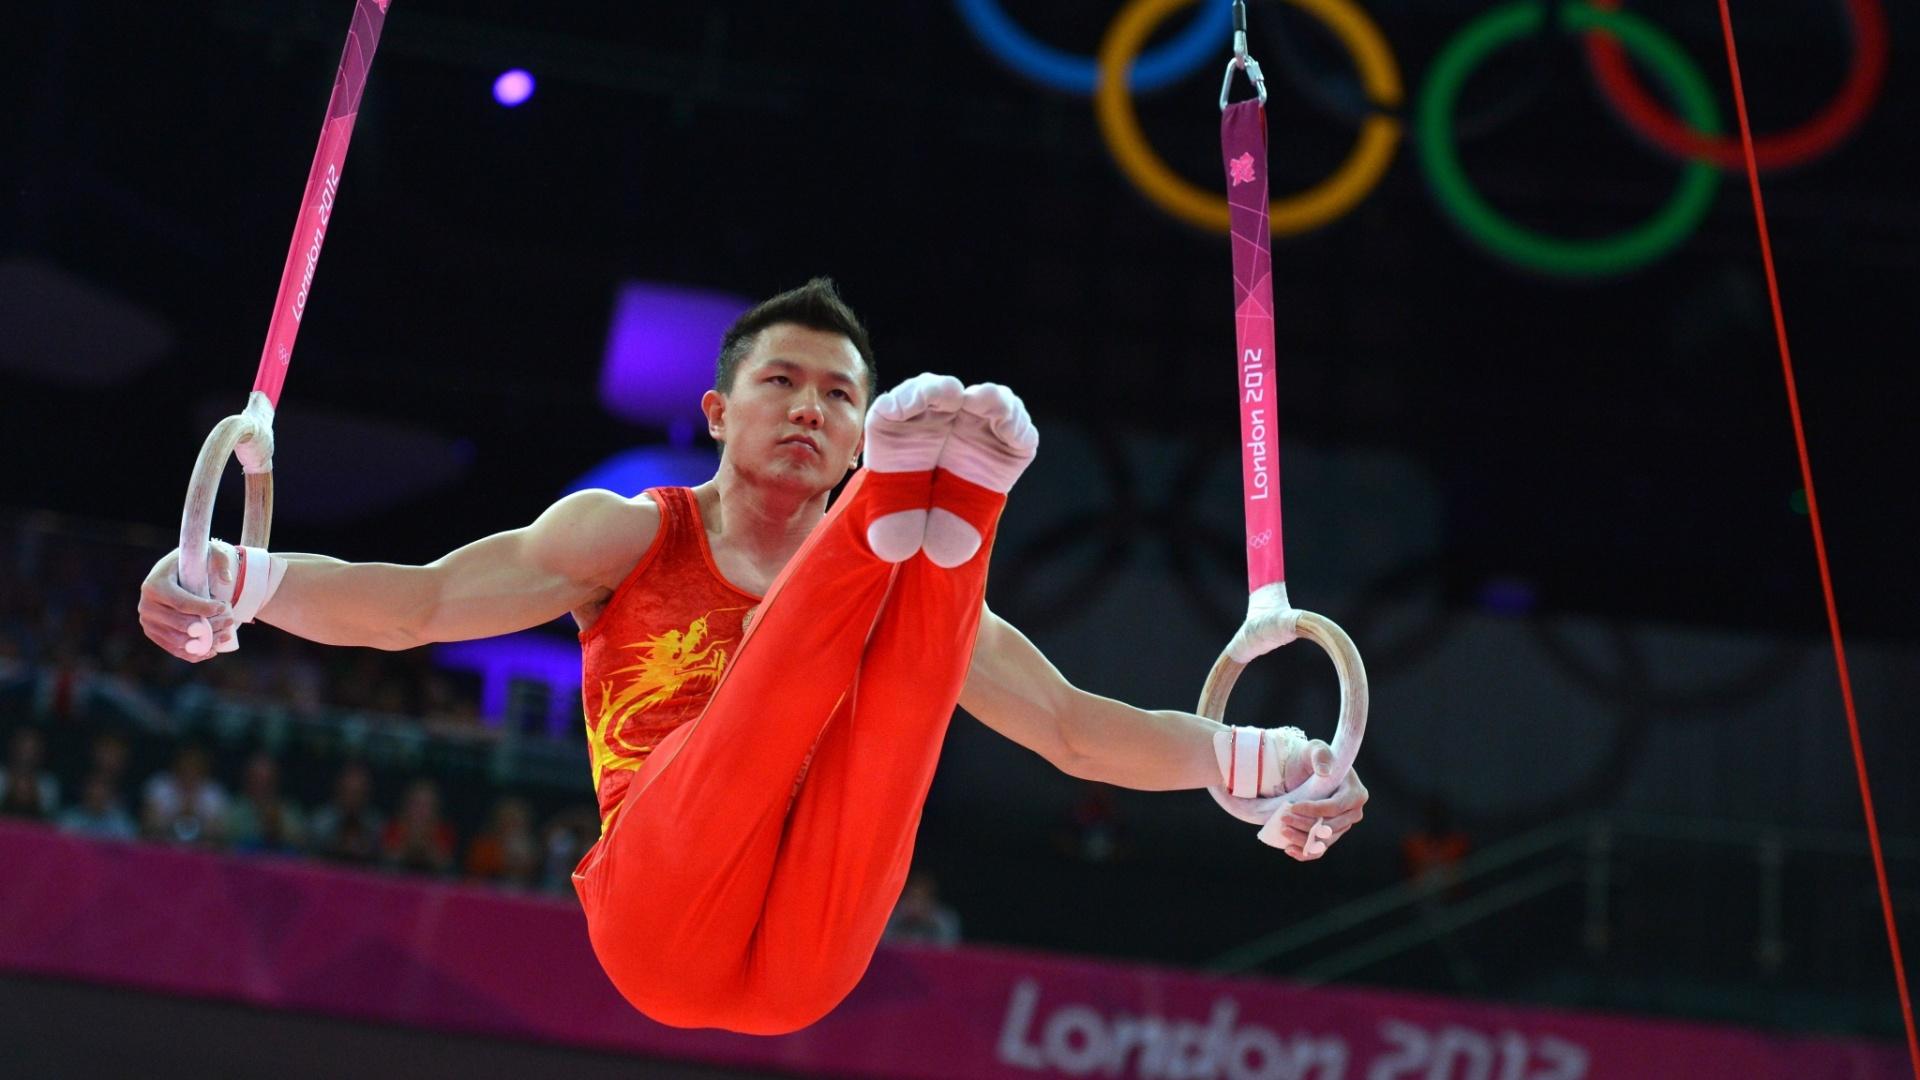 Yibing Chen se apresenta nas argolas; o chinês era favorito, mas foi superado pelo brasileiro Arthur Zanetti e ficou com a prata